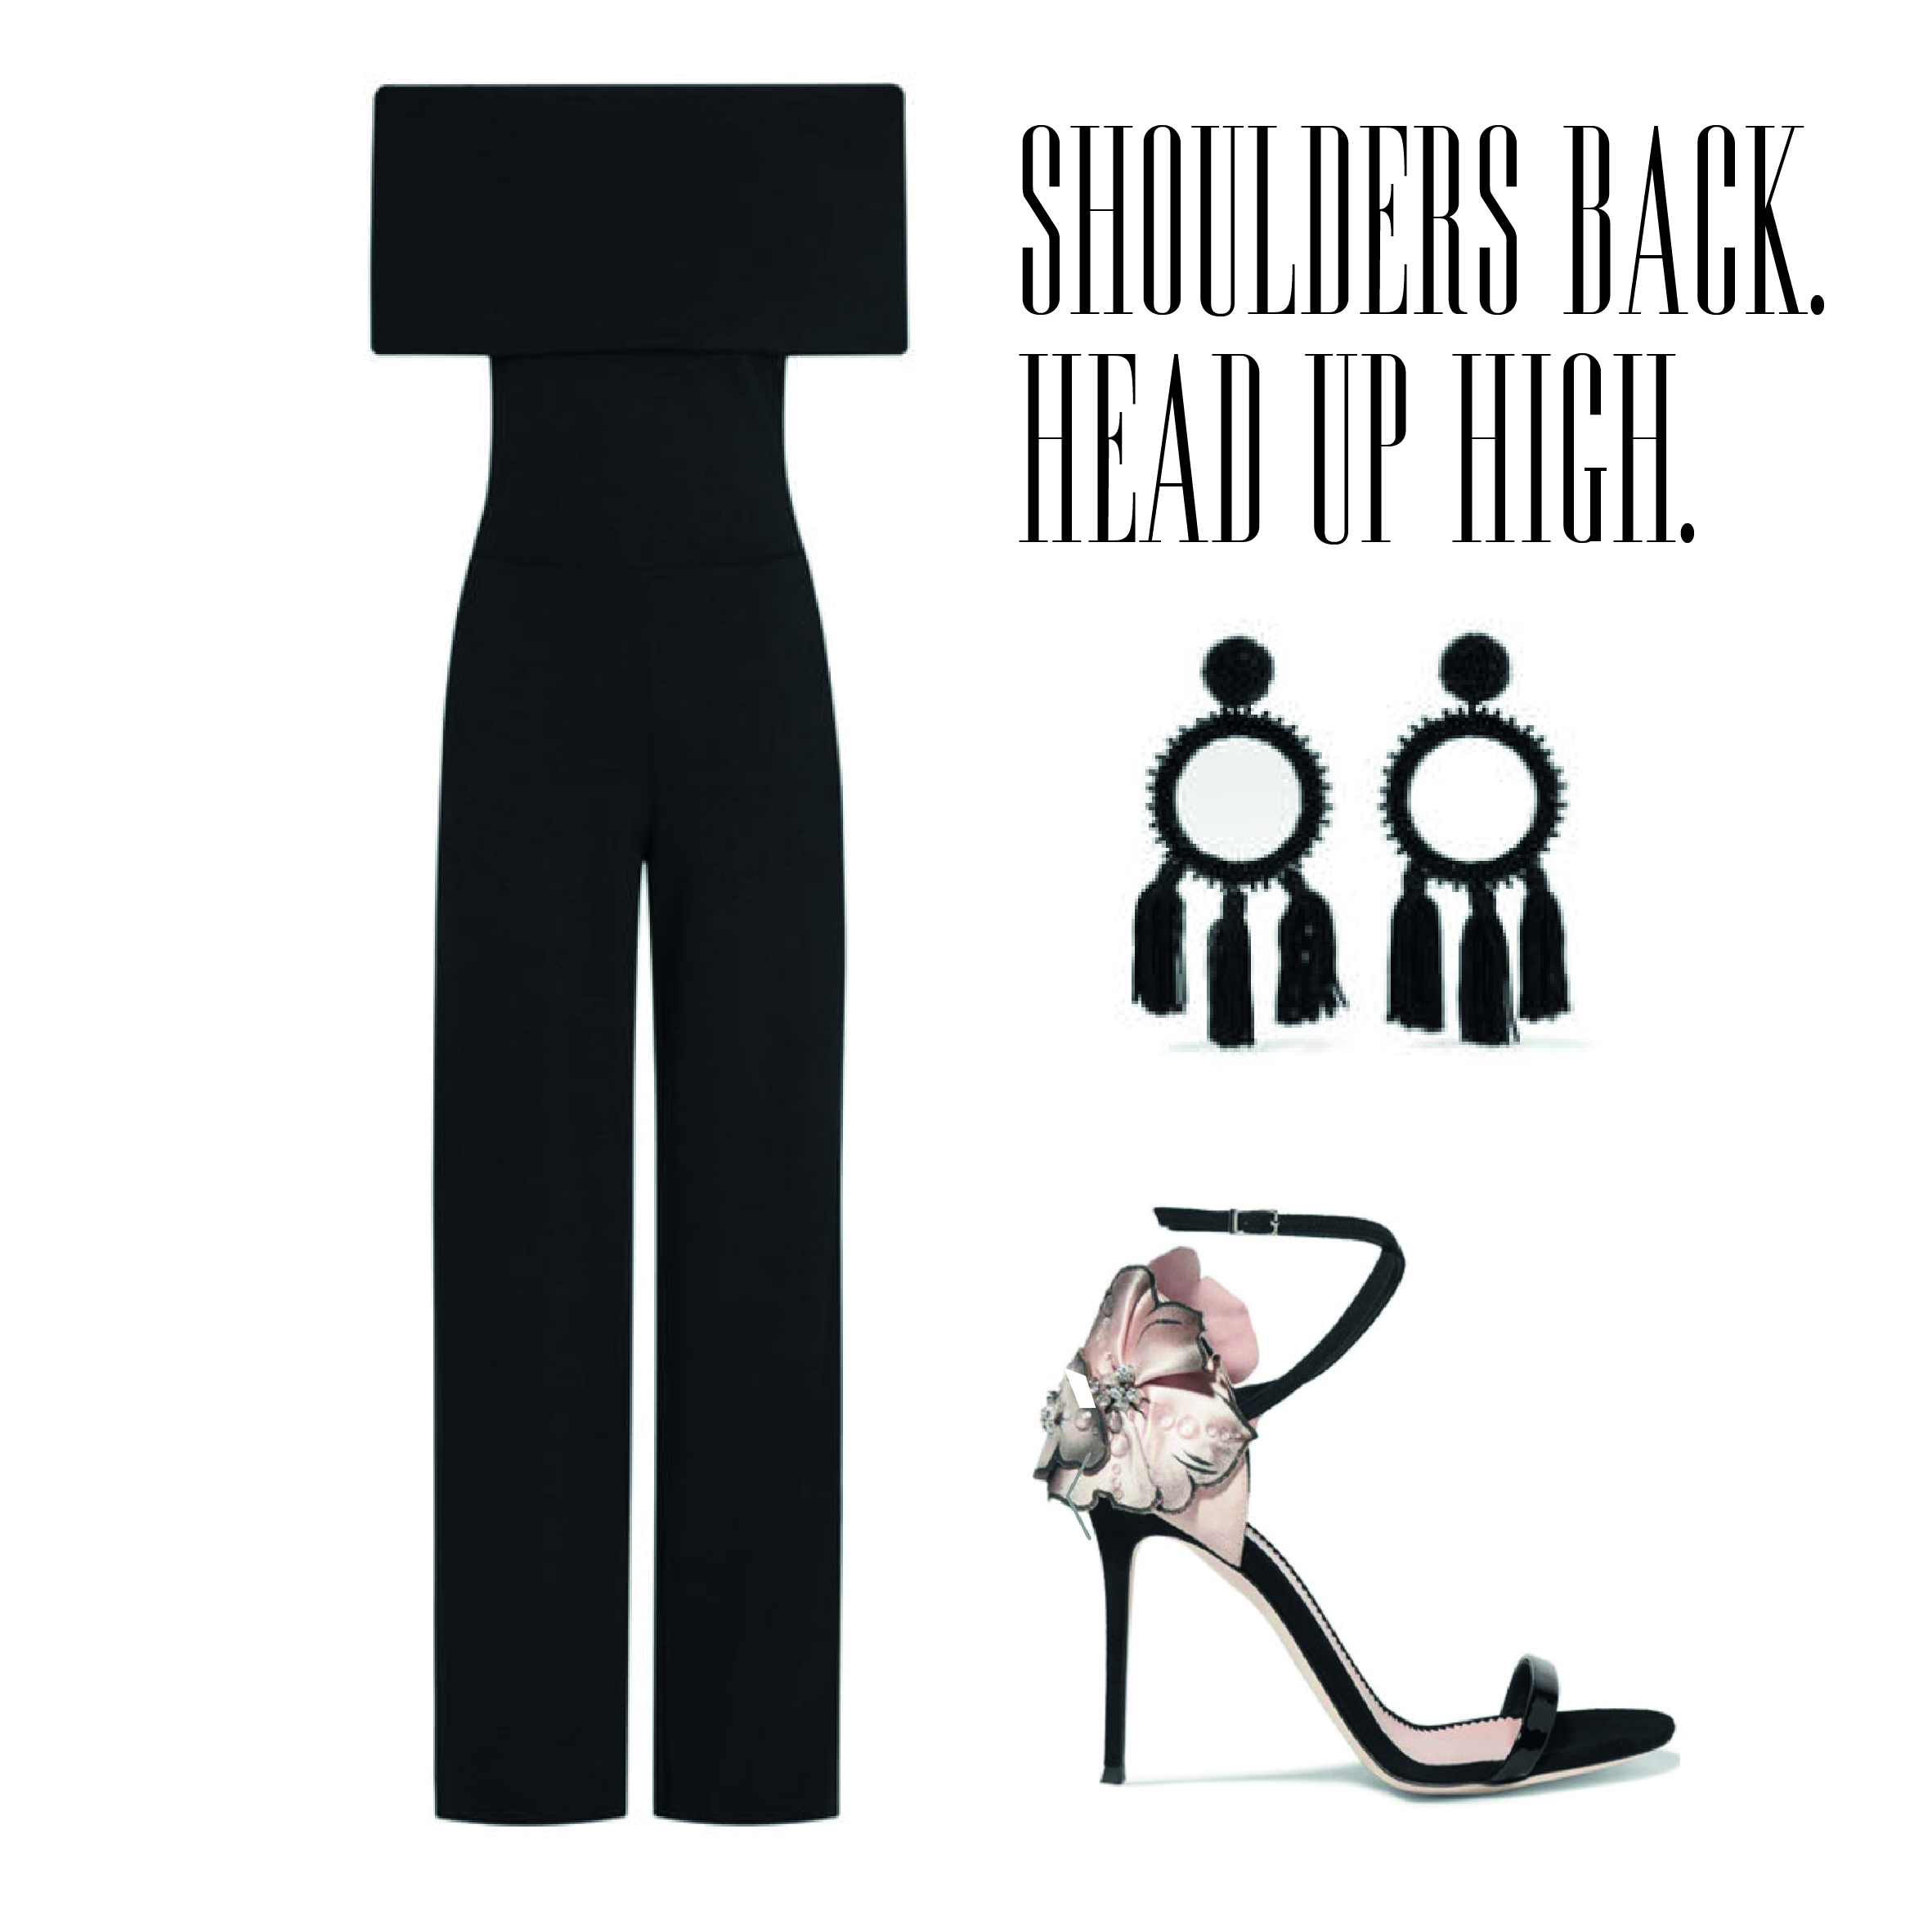 Shoulders Back, Head up High!